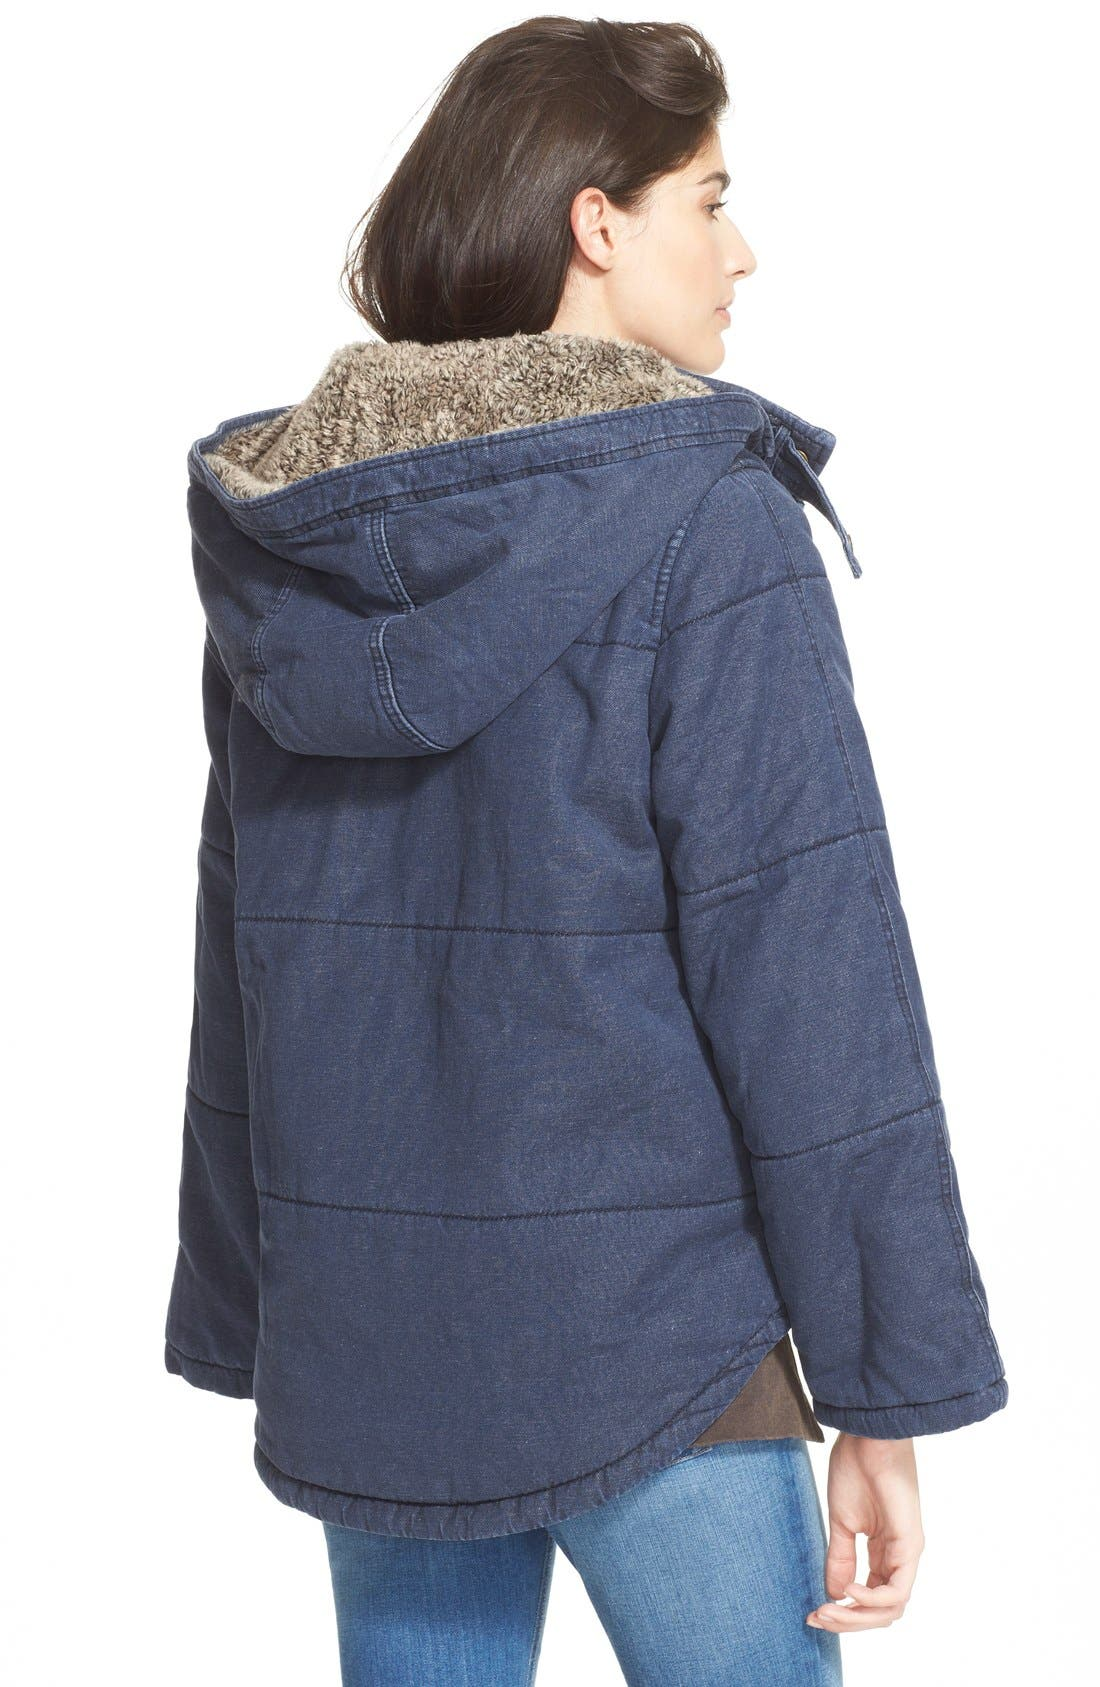 Quilted Denim Jacket,                             Alternate thumbnail 3, color,                             407